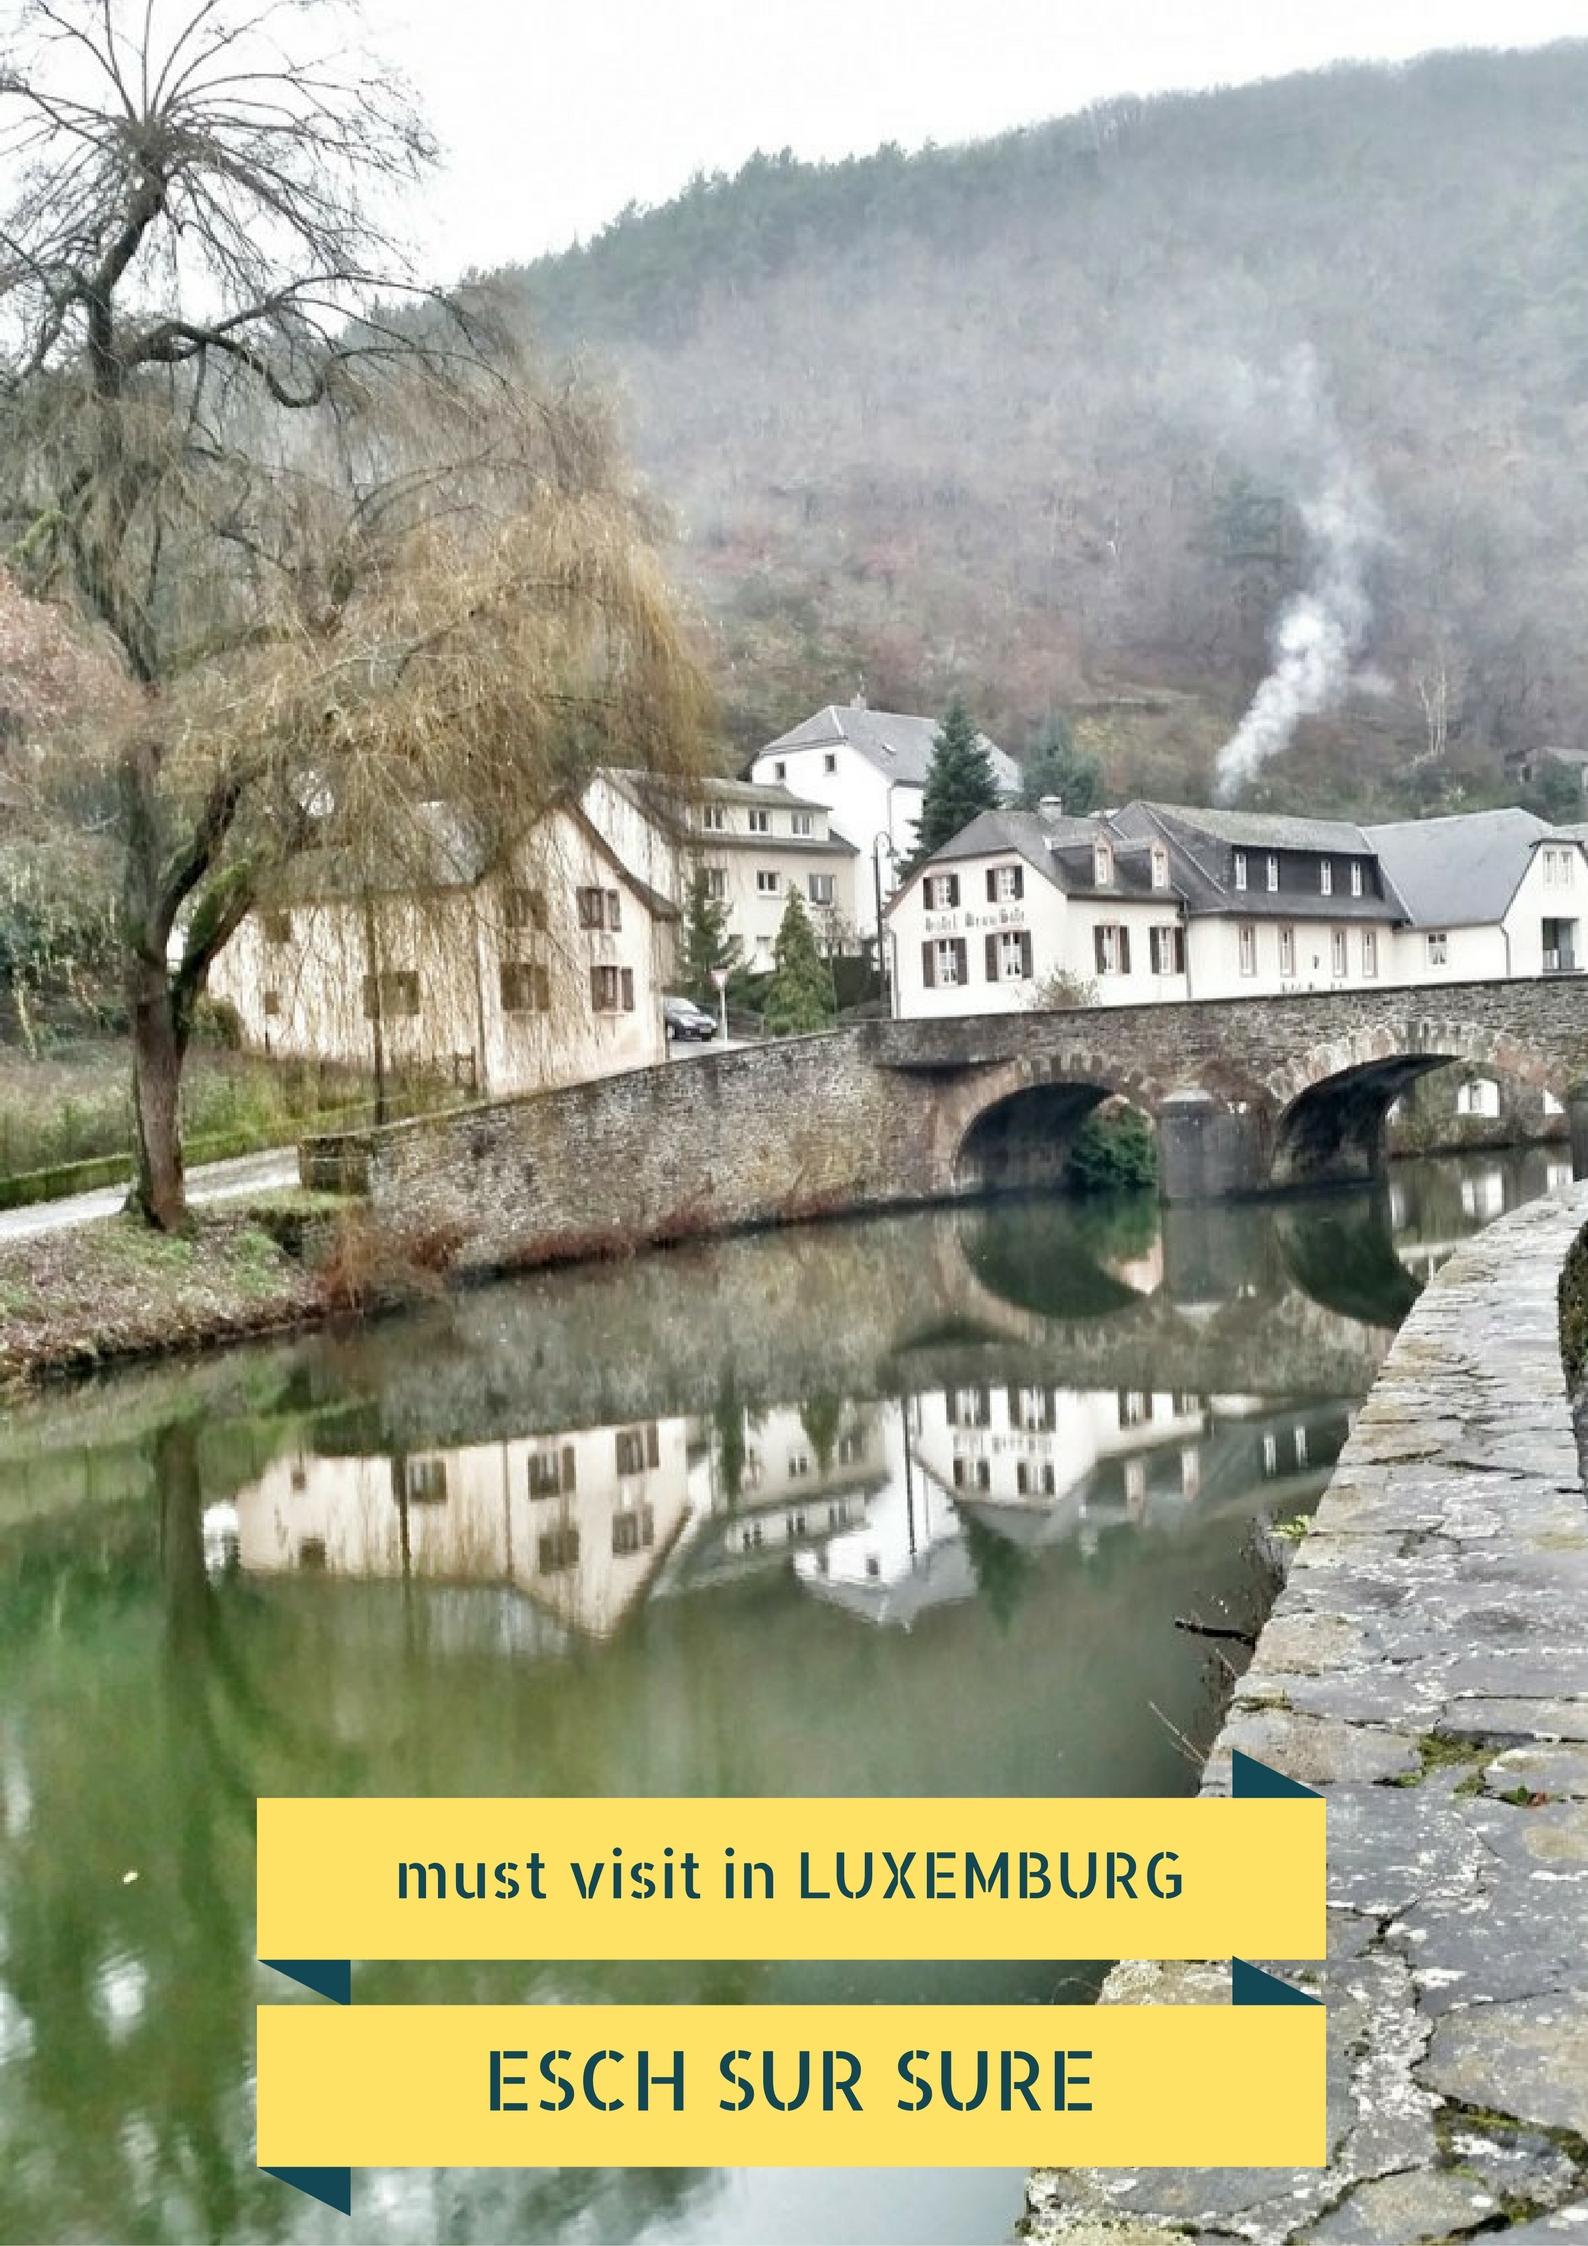 Must visit in Luxemburg: Esch Sur Sure - Map of Joy